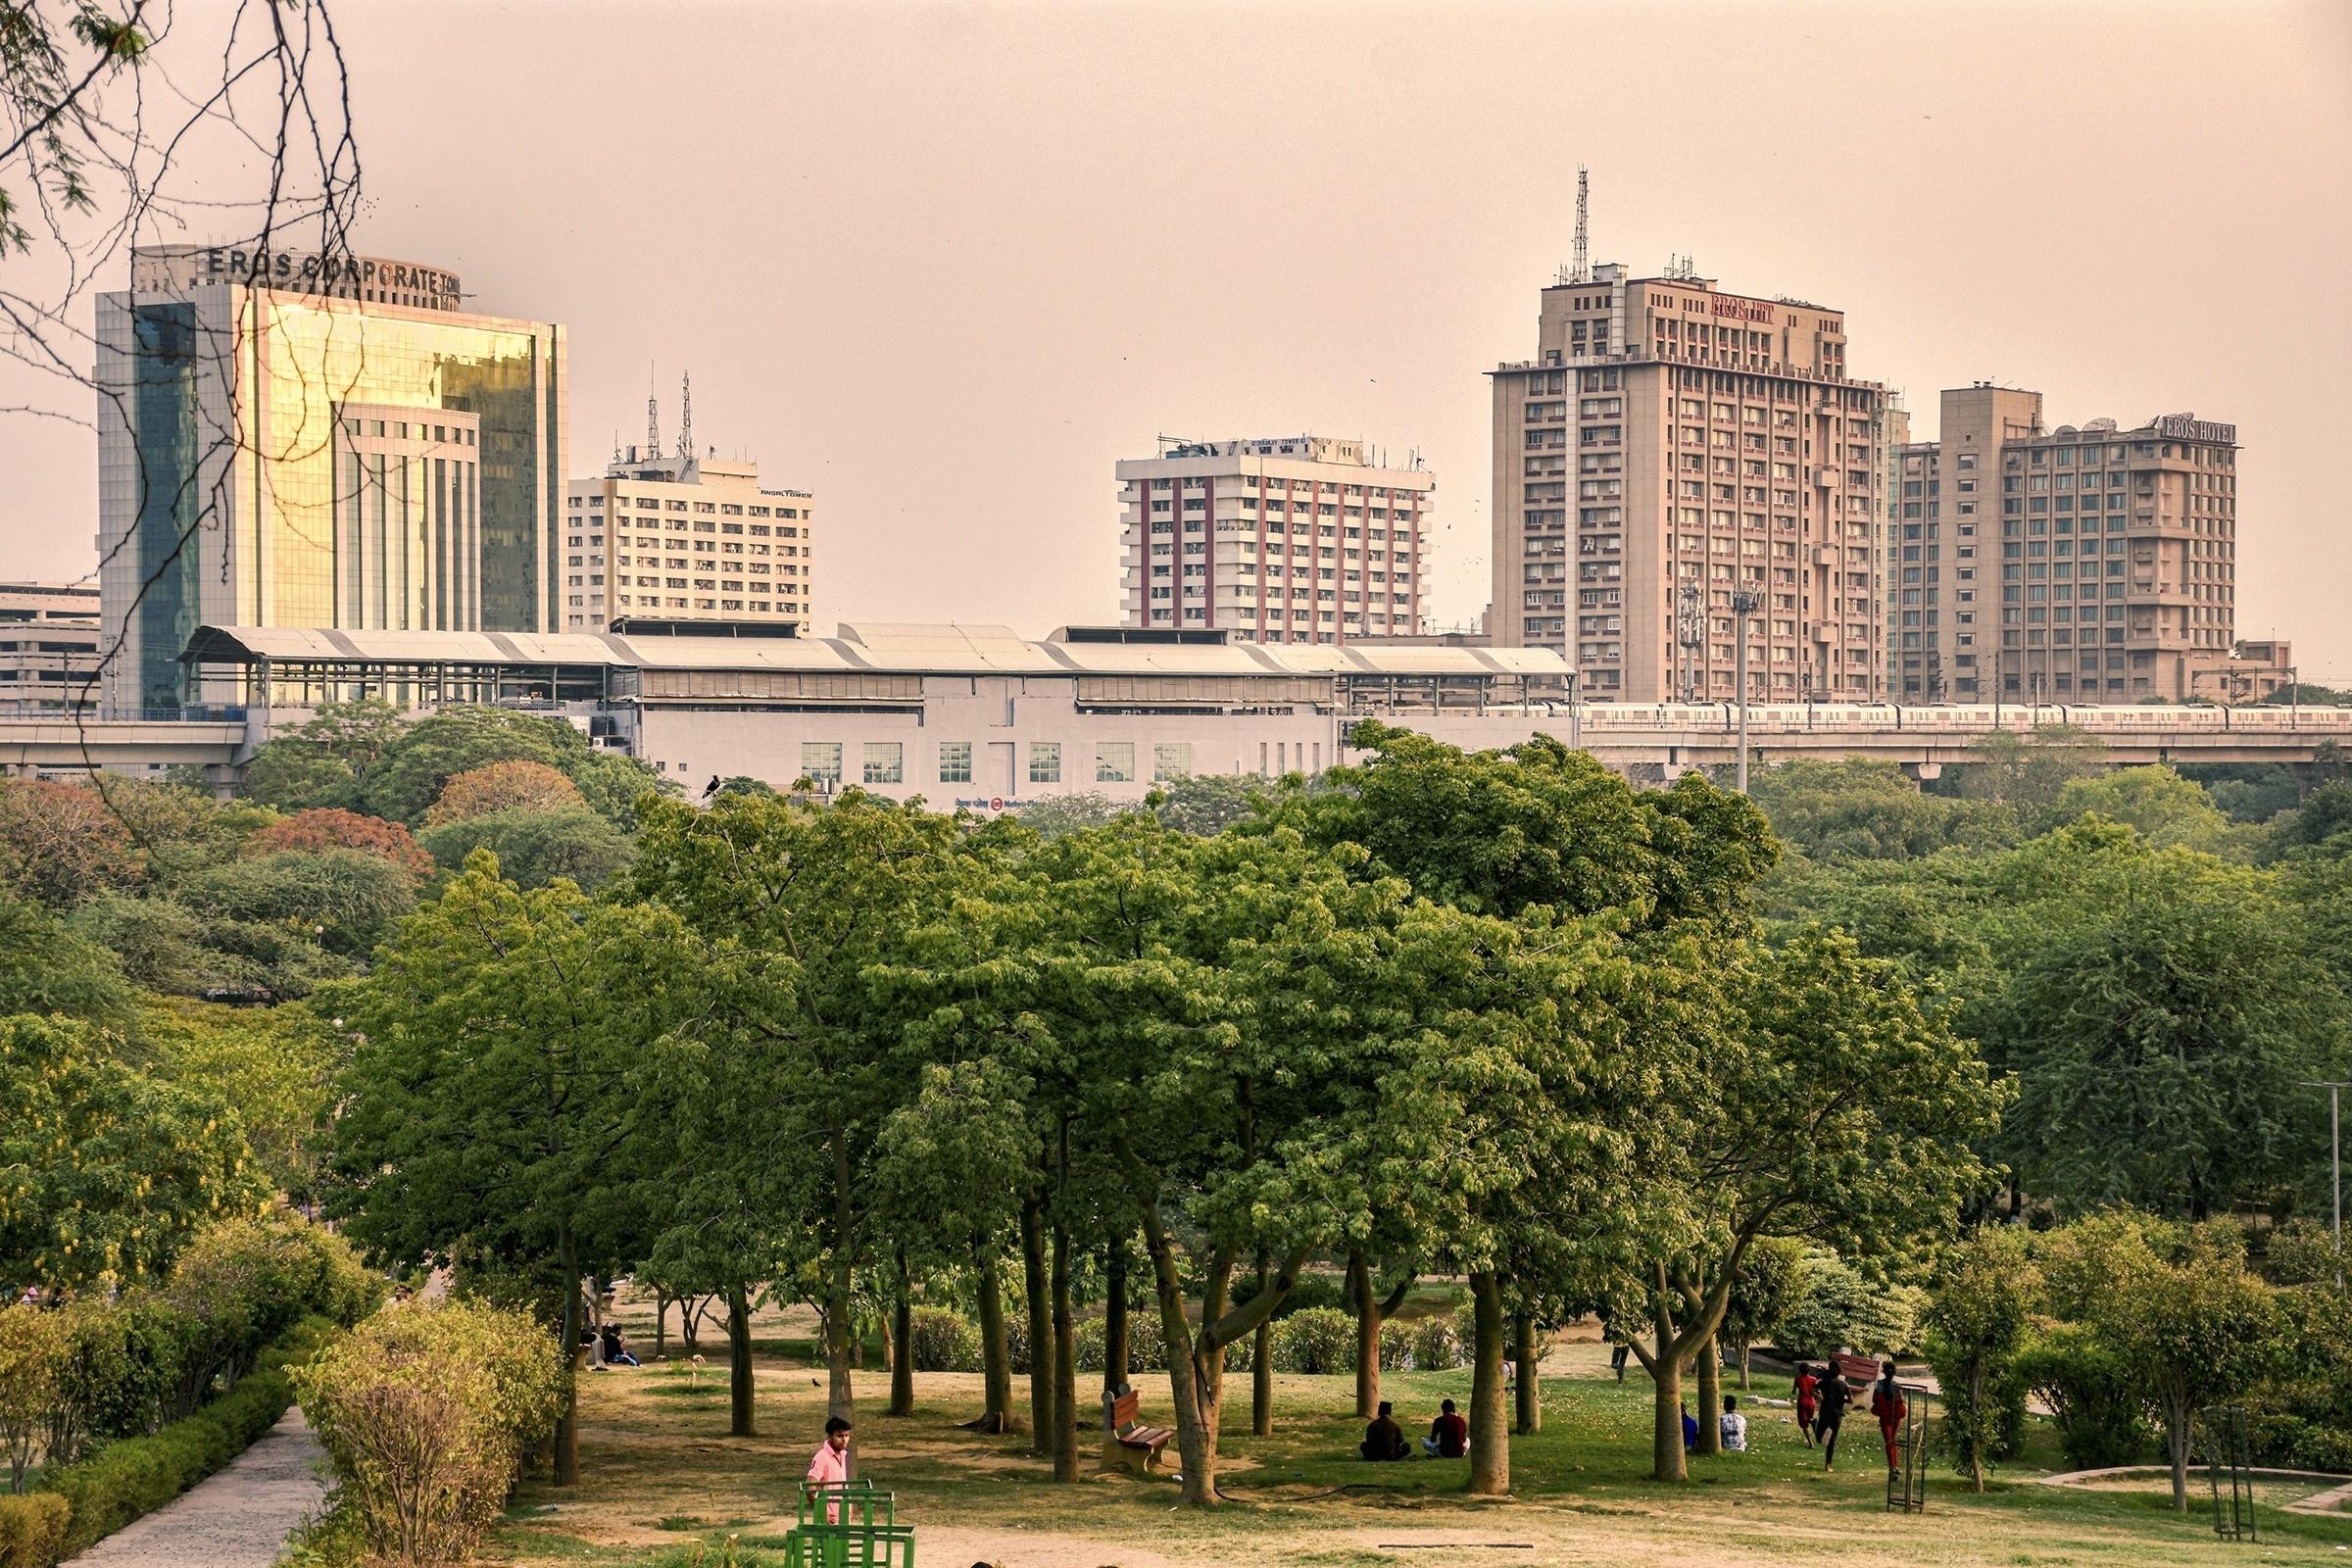 A park behind buildings